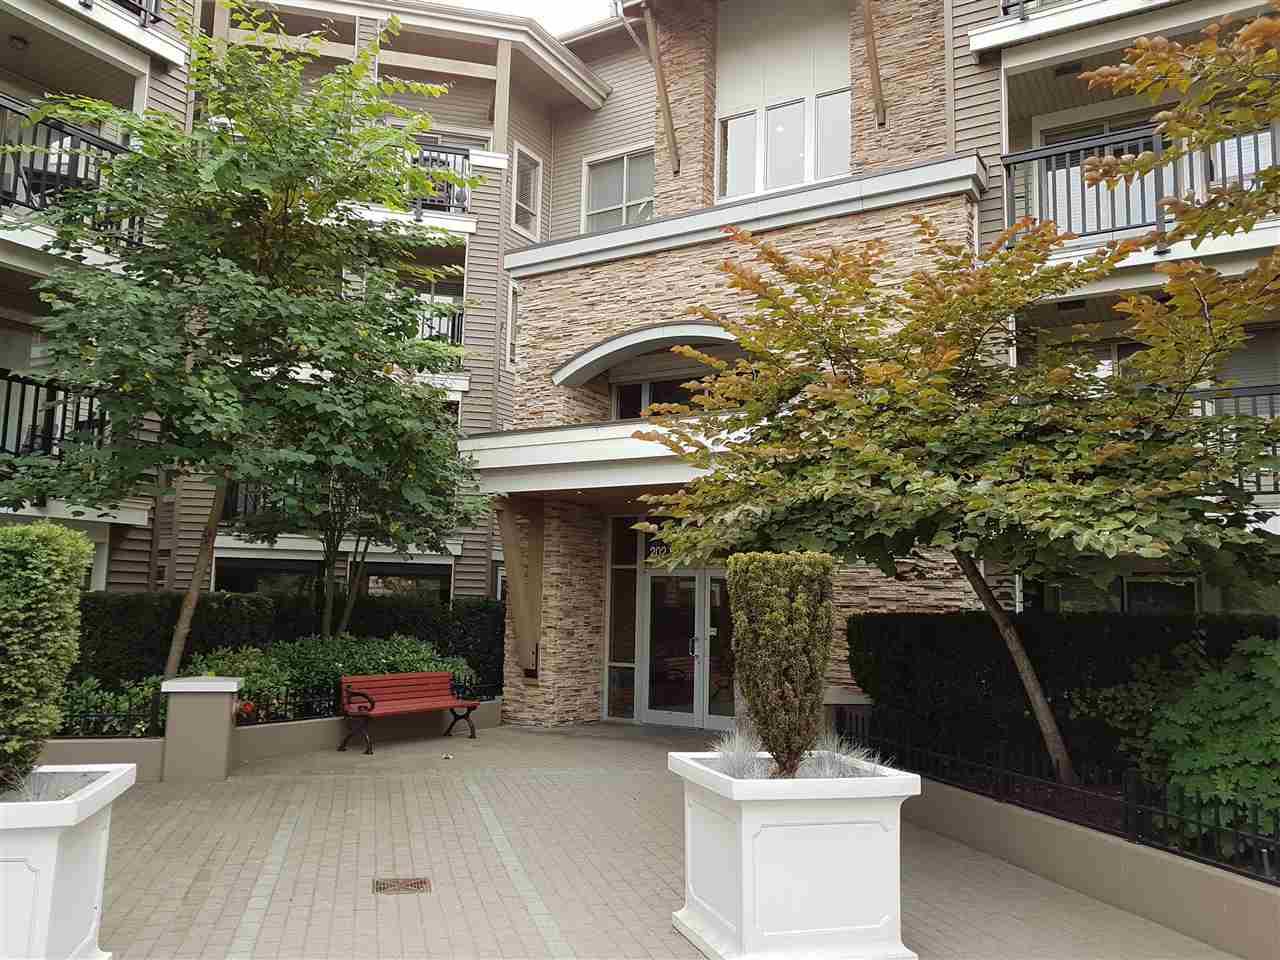 Condo Apartment at 310 8915 202 STREET, Unit 310, Langley, British Columbia. Image 1